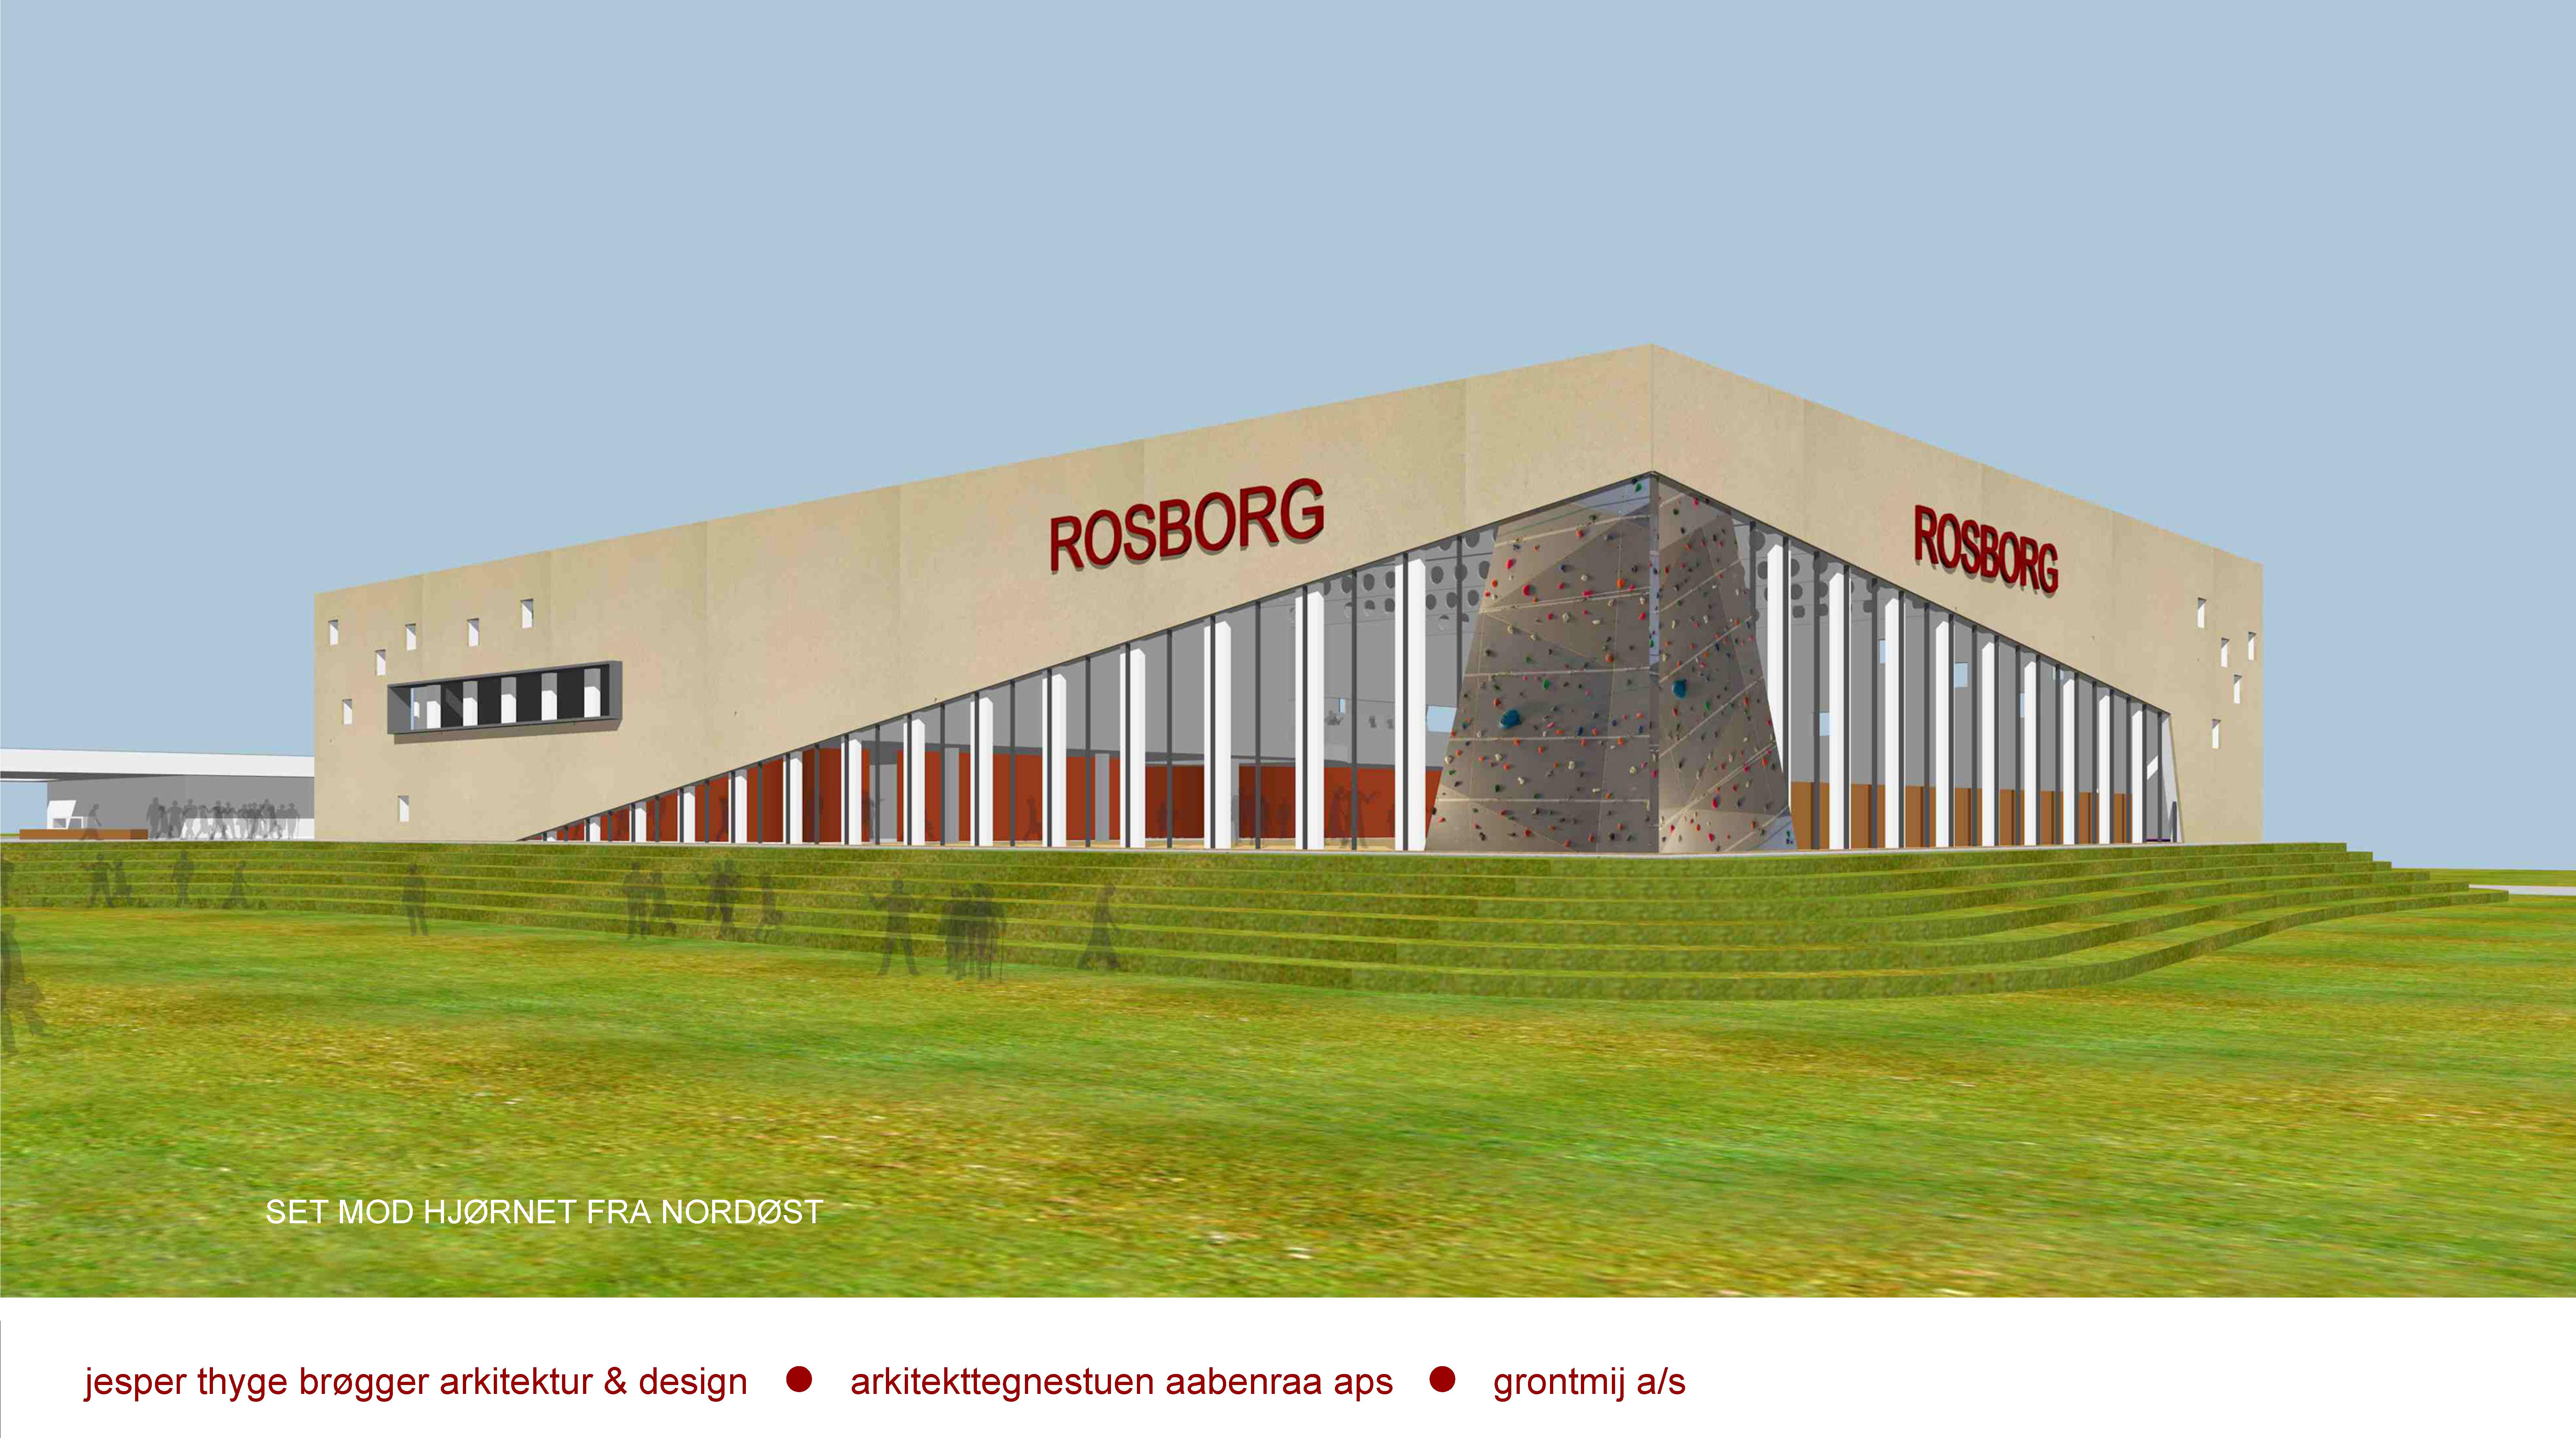 Rosborg Gymnasium Arkitekttegnestuen Aabenraa Interiors Inside Ideas Interiors design about Everything [magnanprojects.com]